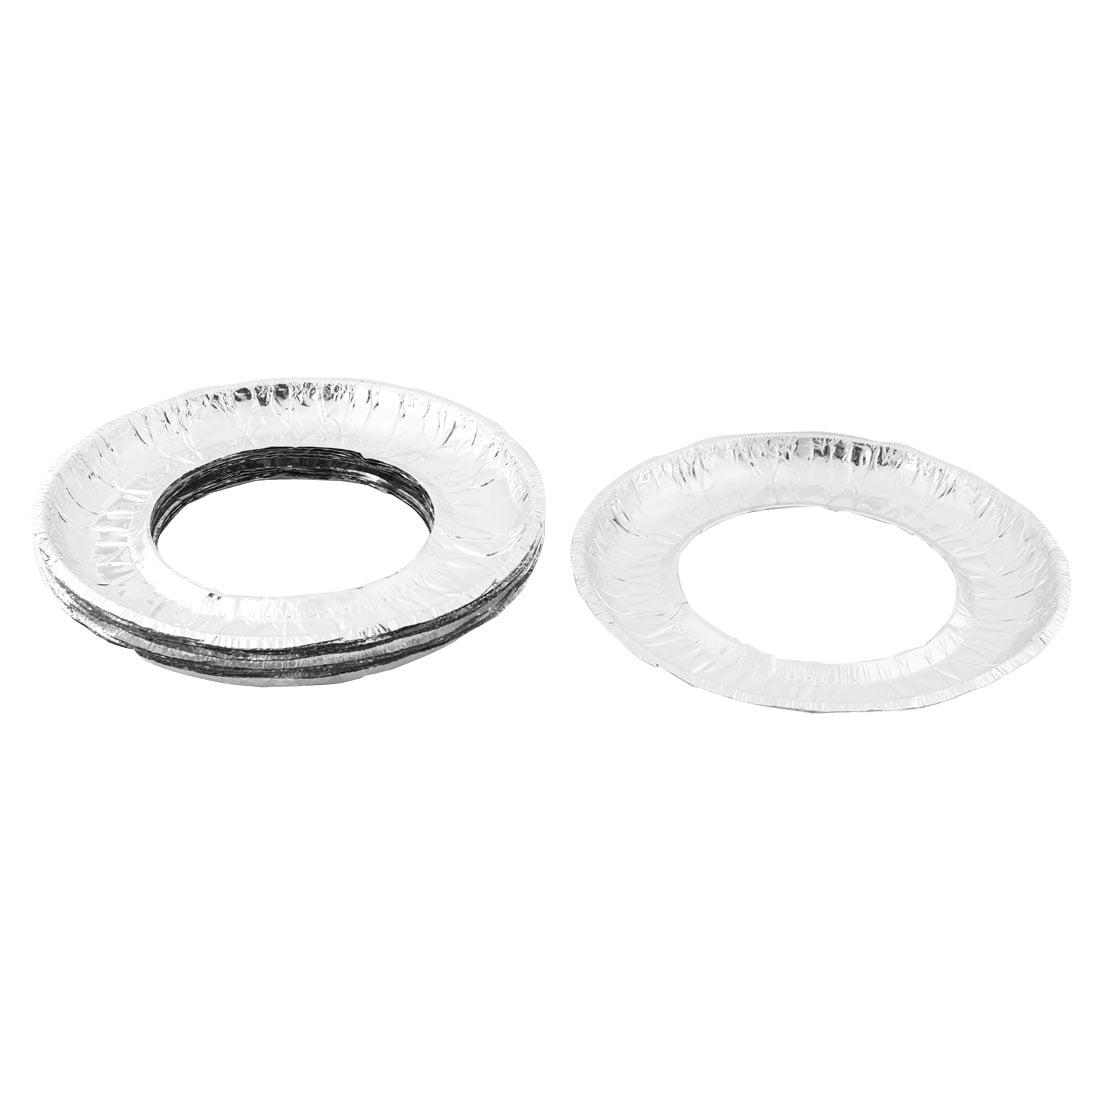 stove liners. home aluminum foil round shaped disposable stove burner bib liners covers 20 pcs i